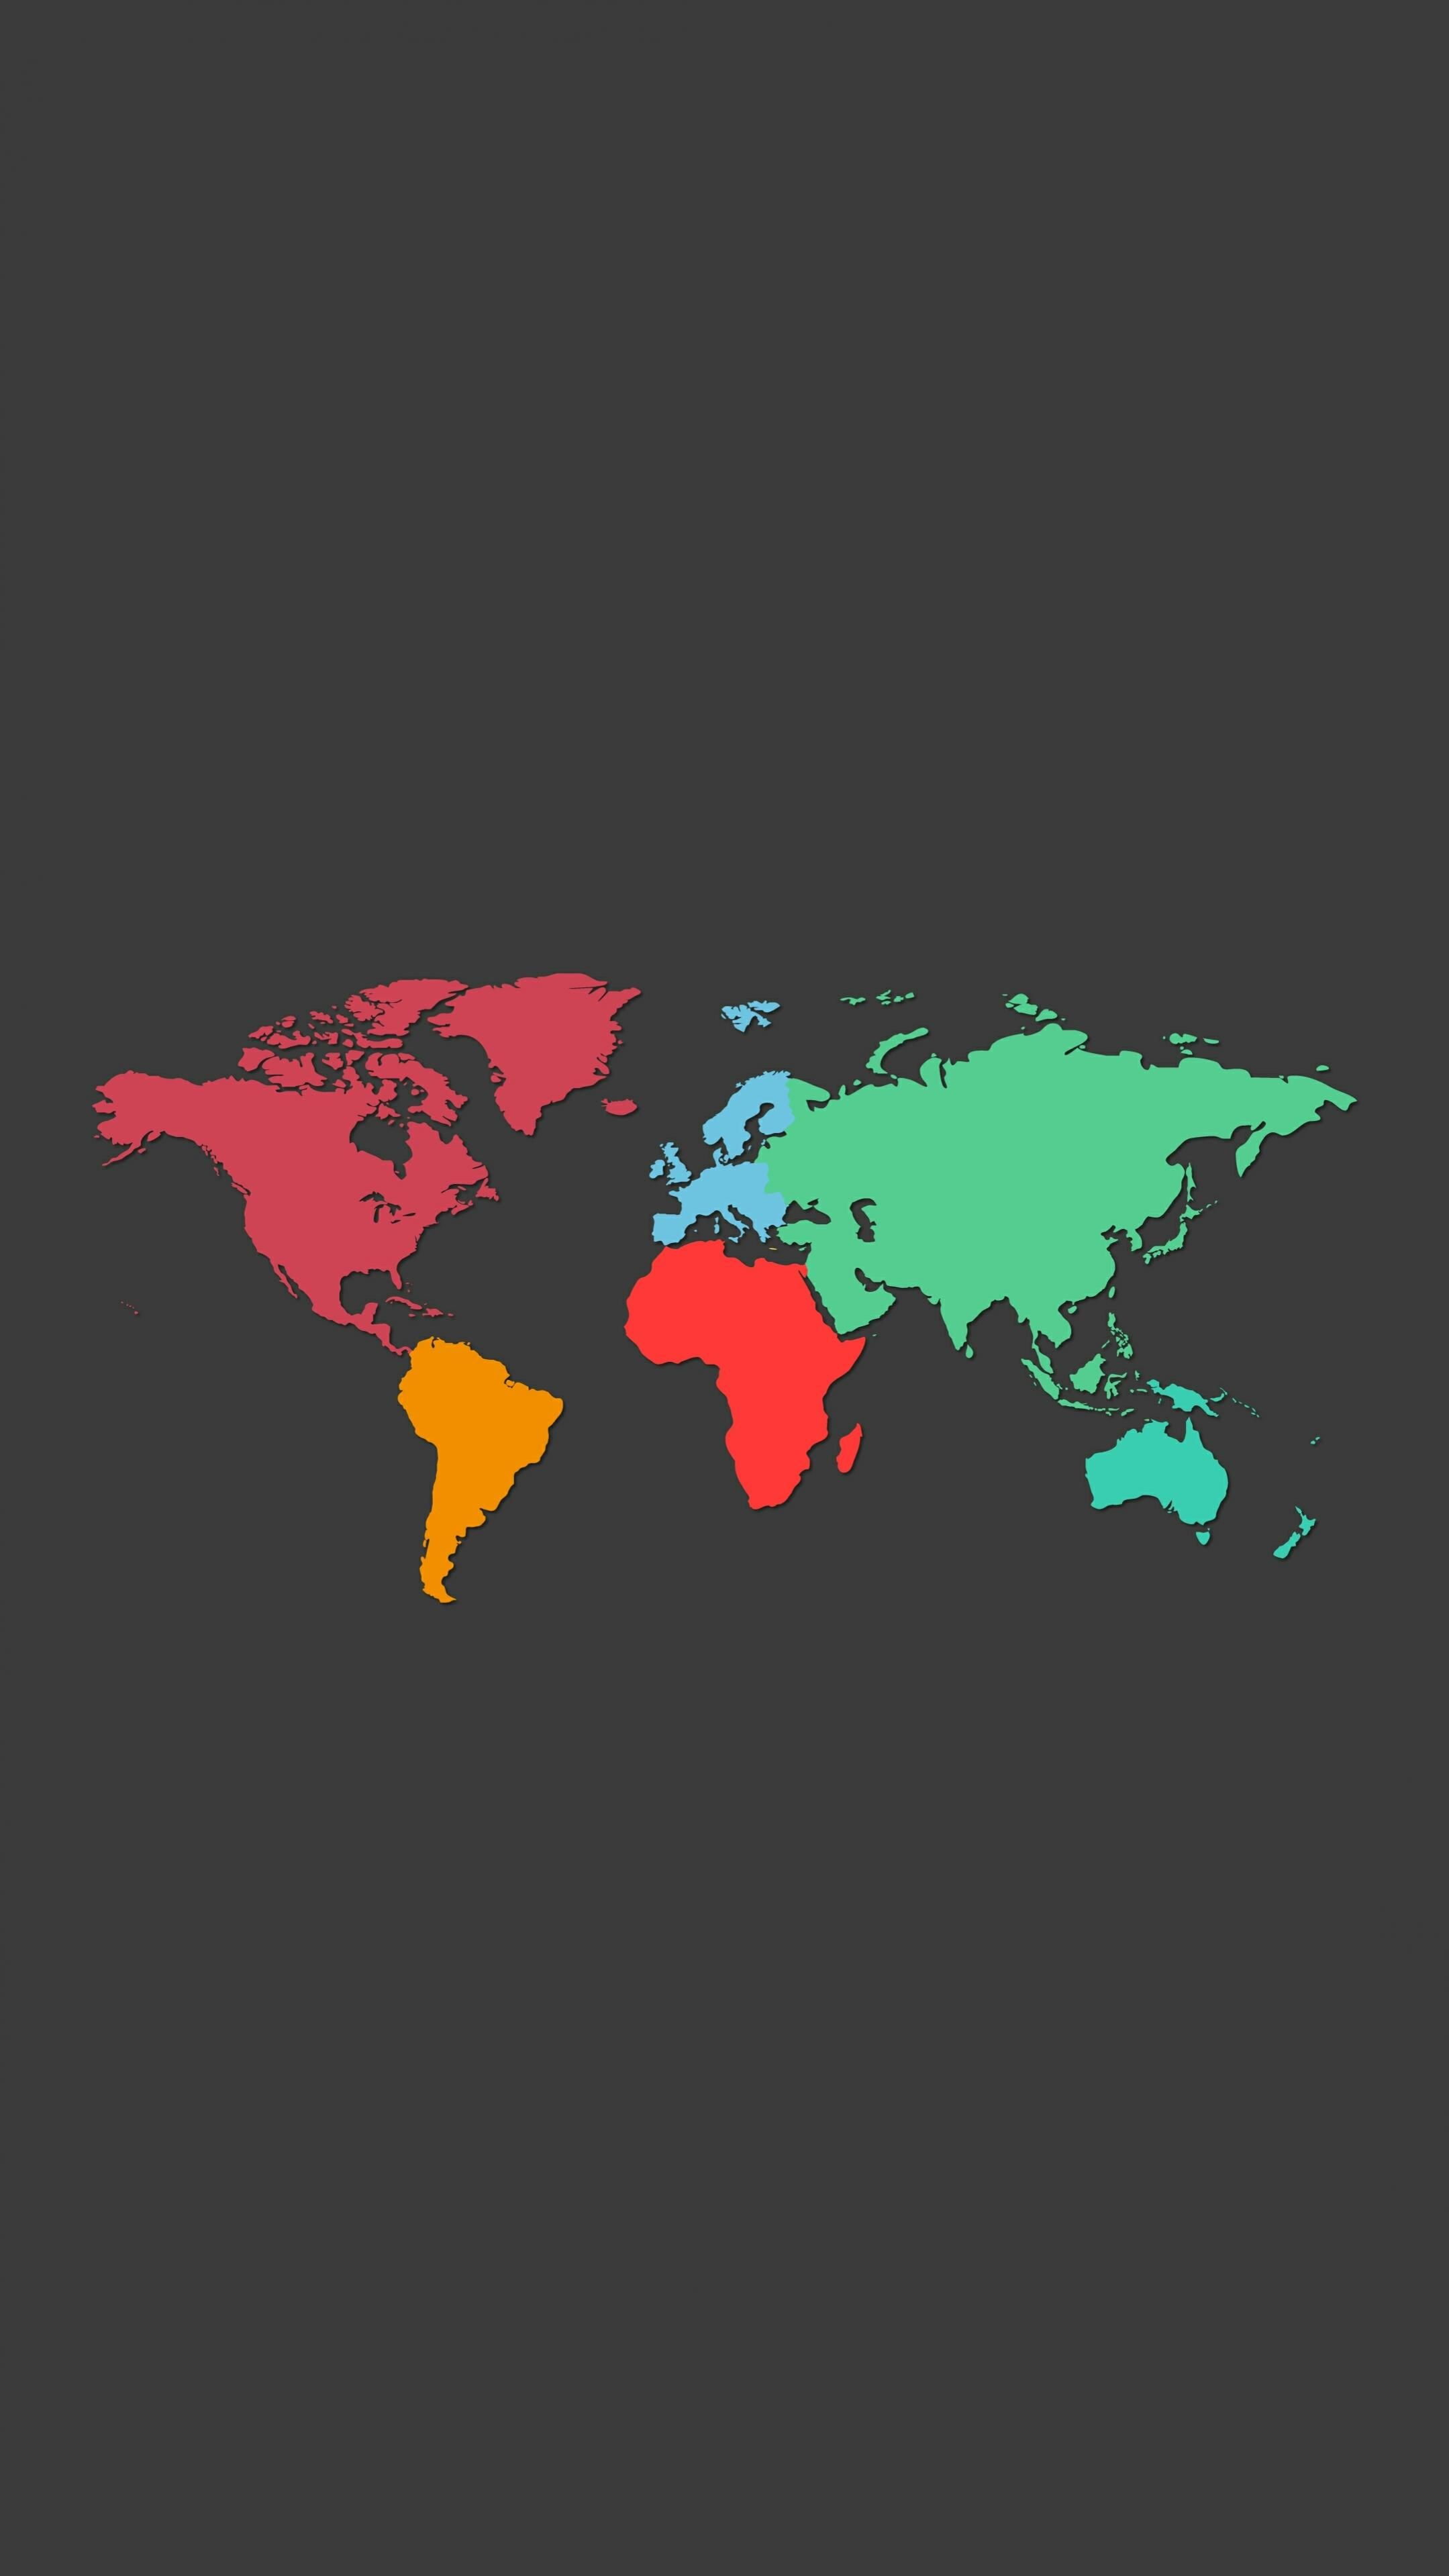 Amoled Wallpaper 54 World Wallpaper Android Wallpaper World Map Wallpaper